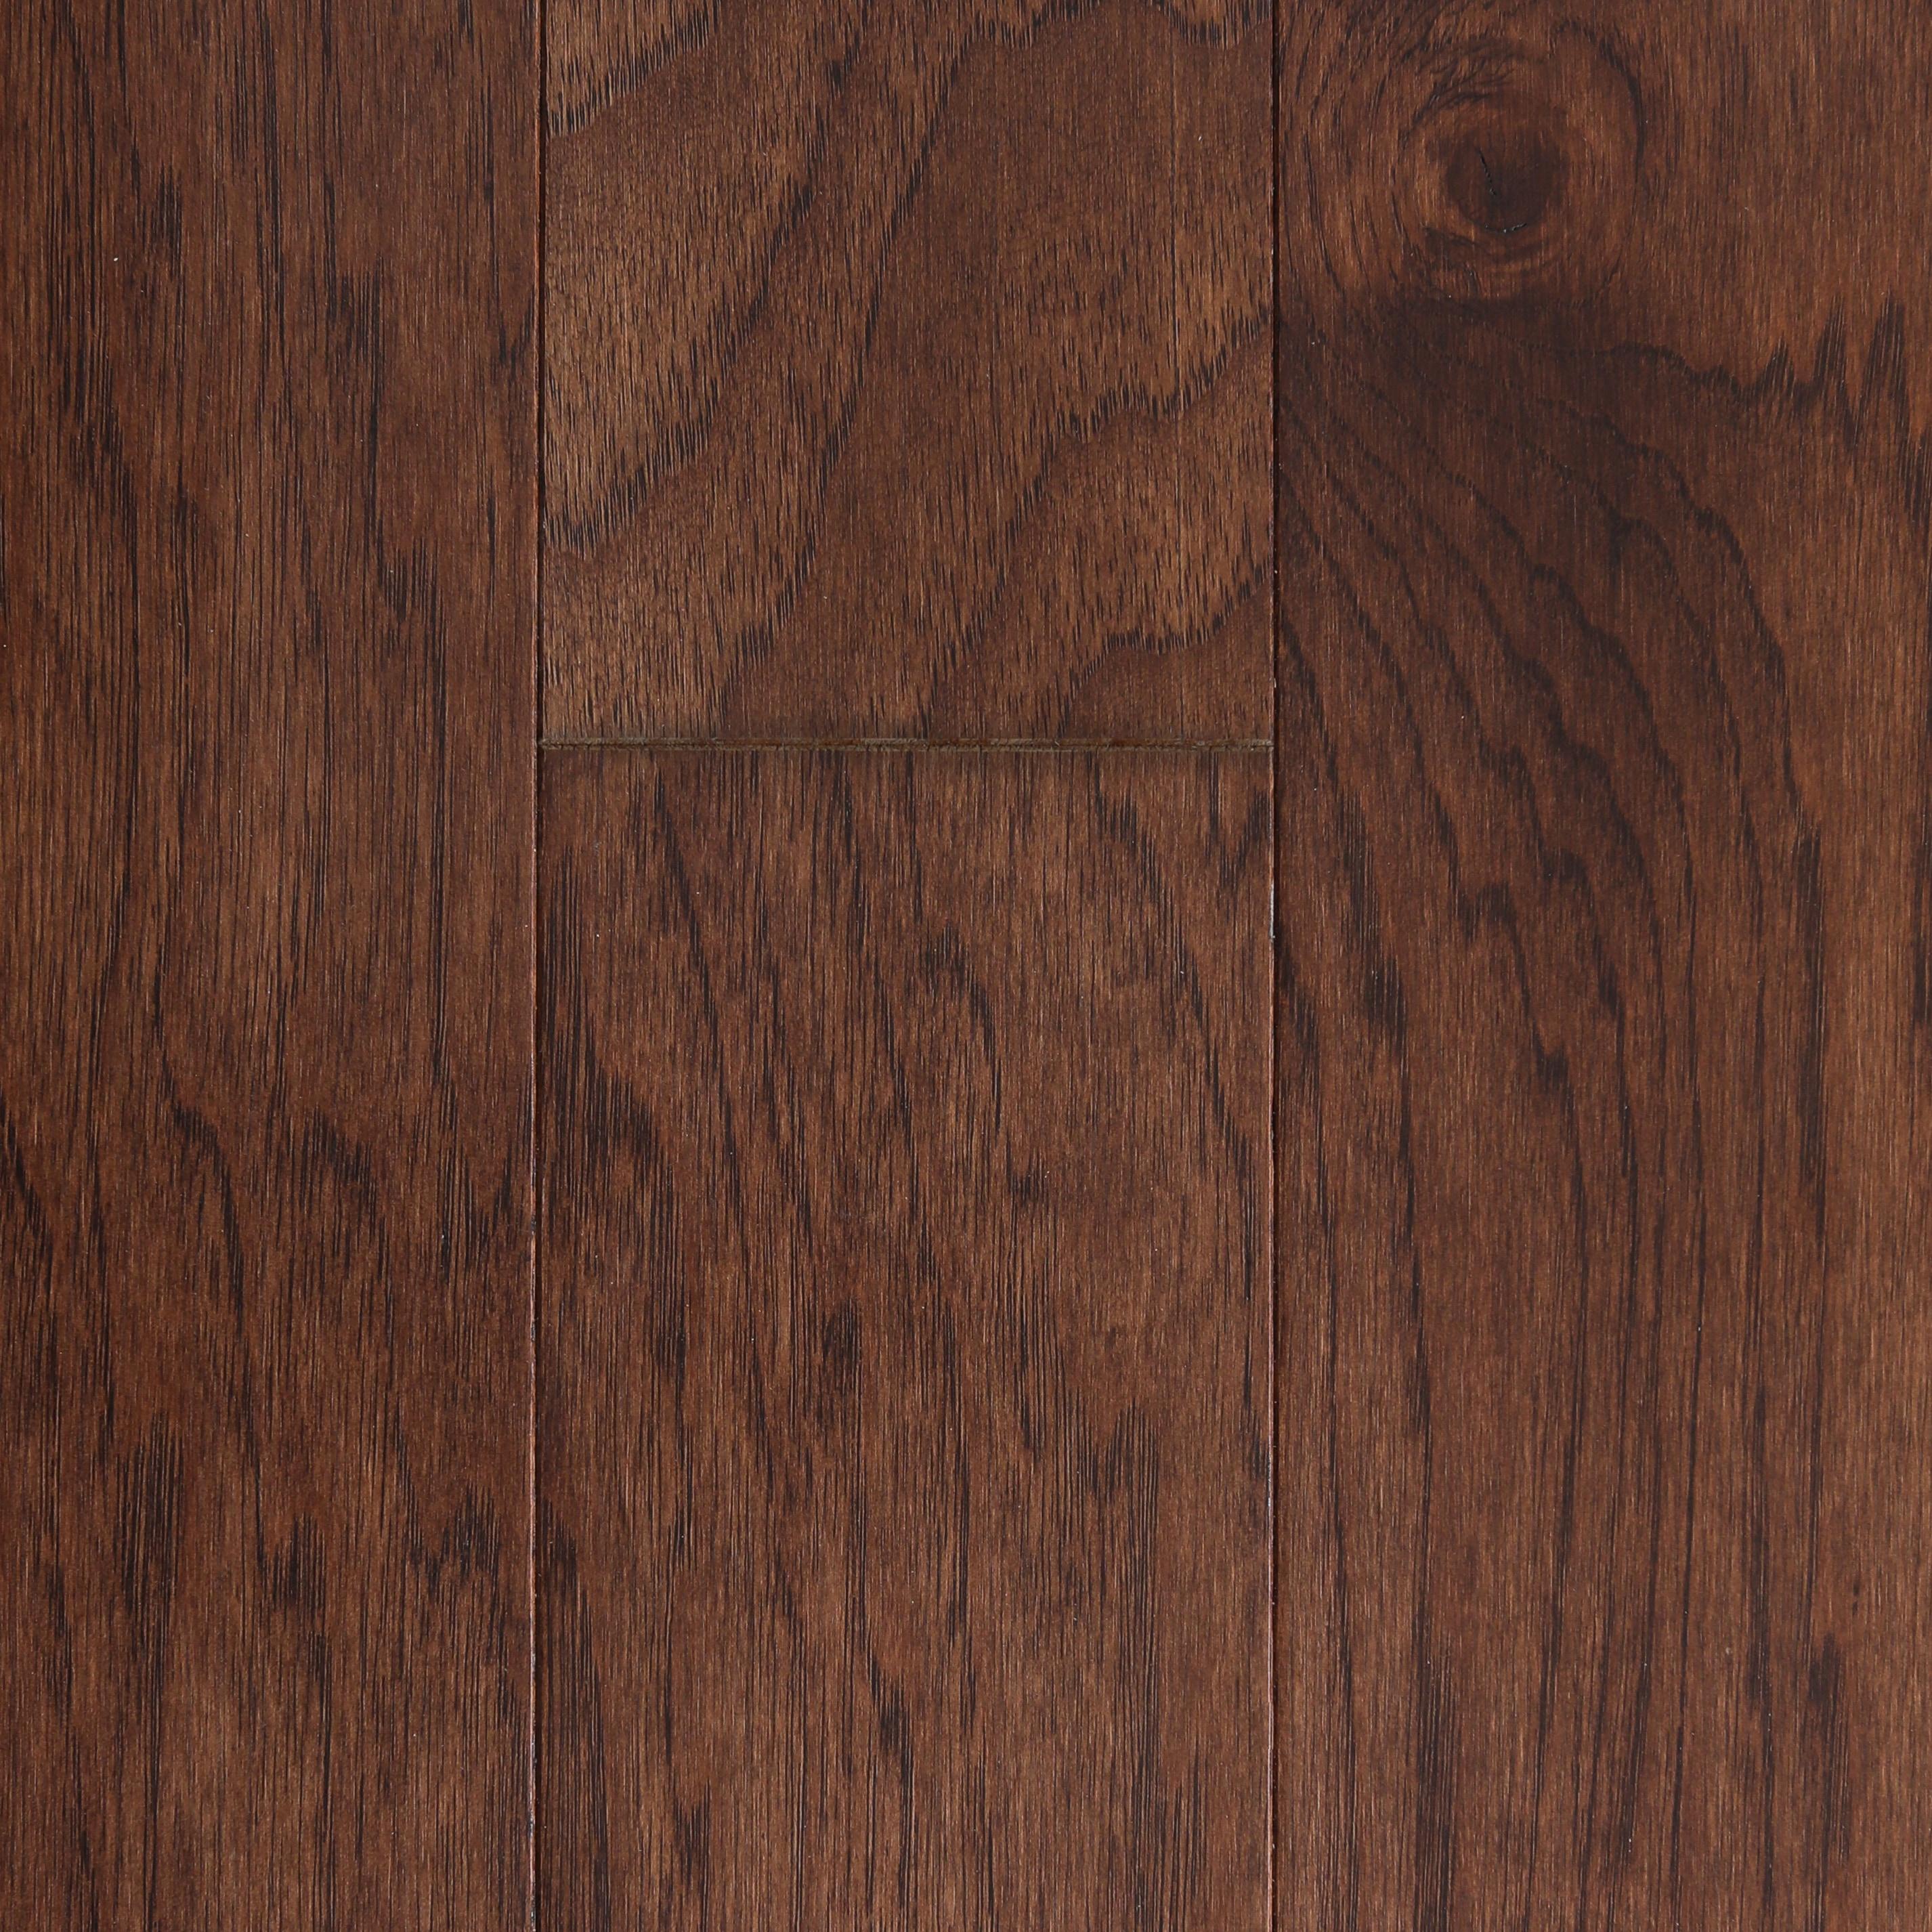 "Chocolate / Hickory / Urethane with AO / Sample Engineered Hardwood - 5"" Hickory - Berkshire Collection 0"